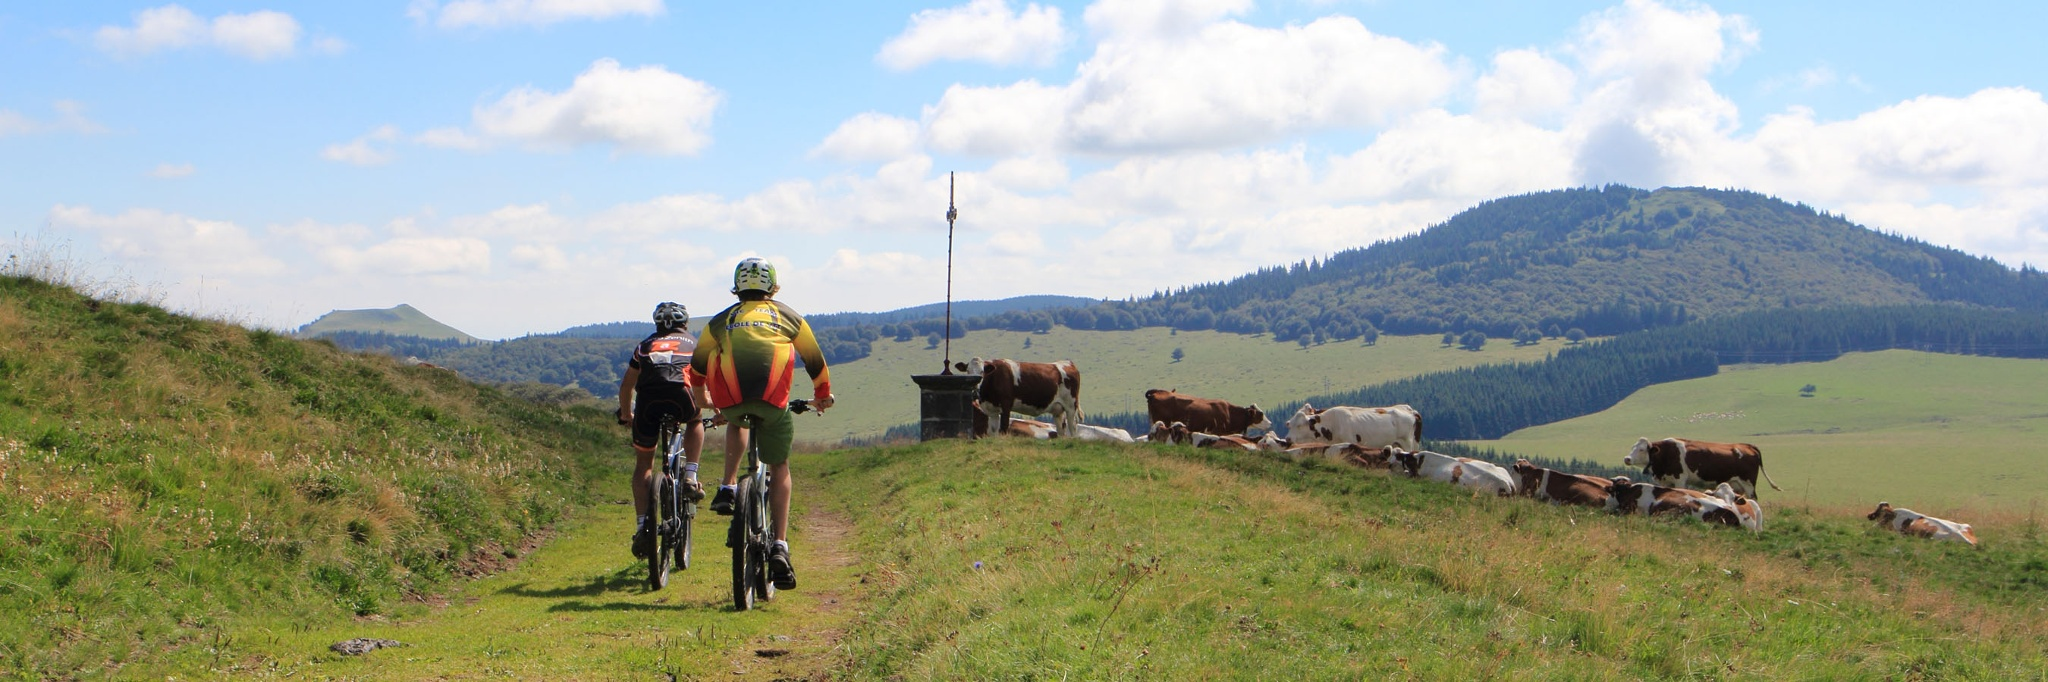 Mountain Biking Trails In Puy De Dôme Travel Guide Outdooractive Com